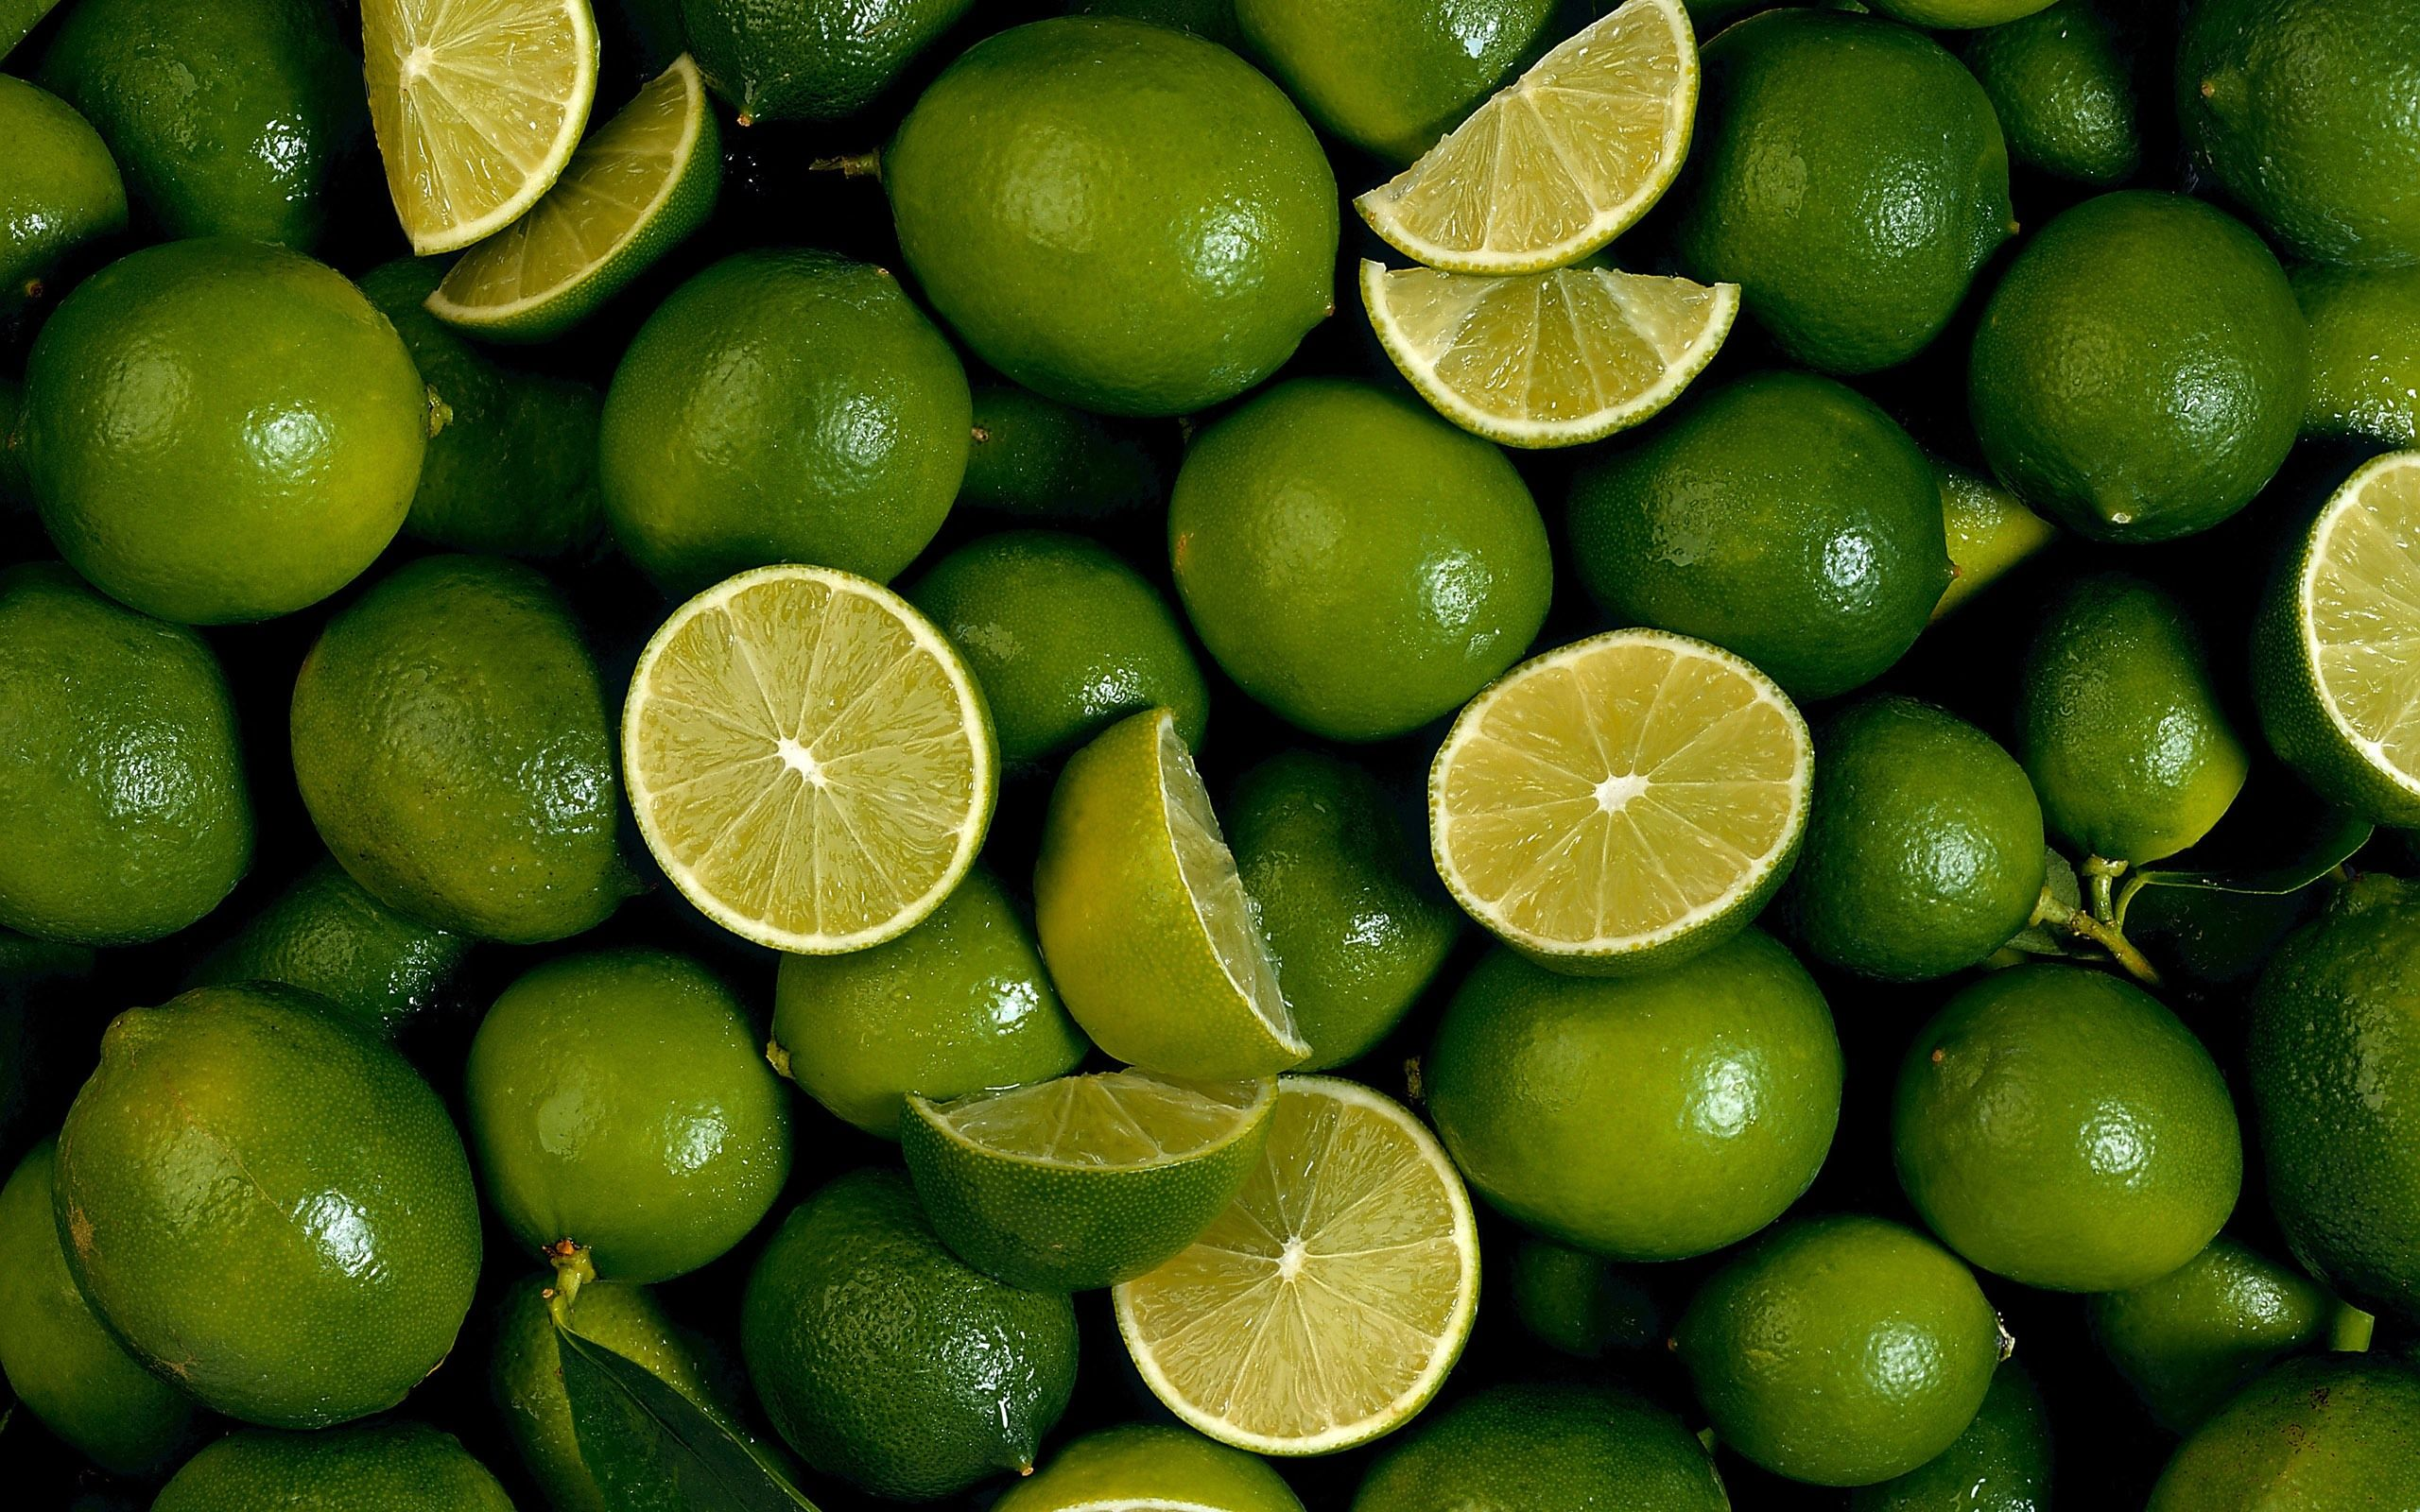 Lime Green Wallpaper 21079 1600x1200 px